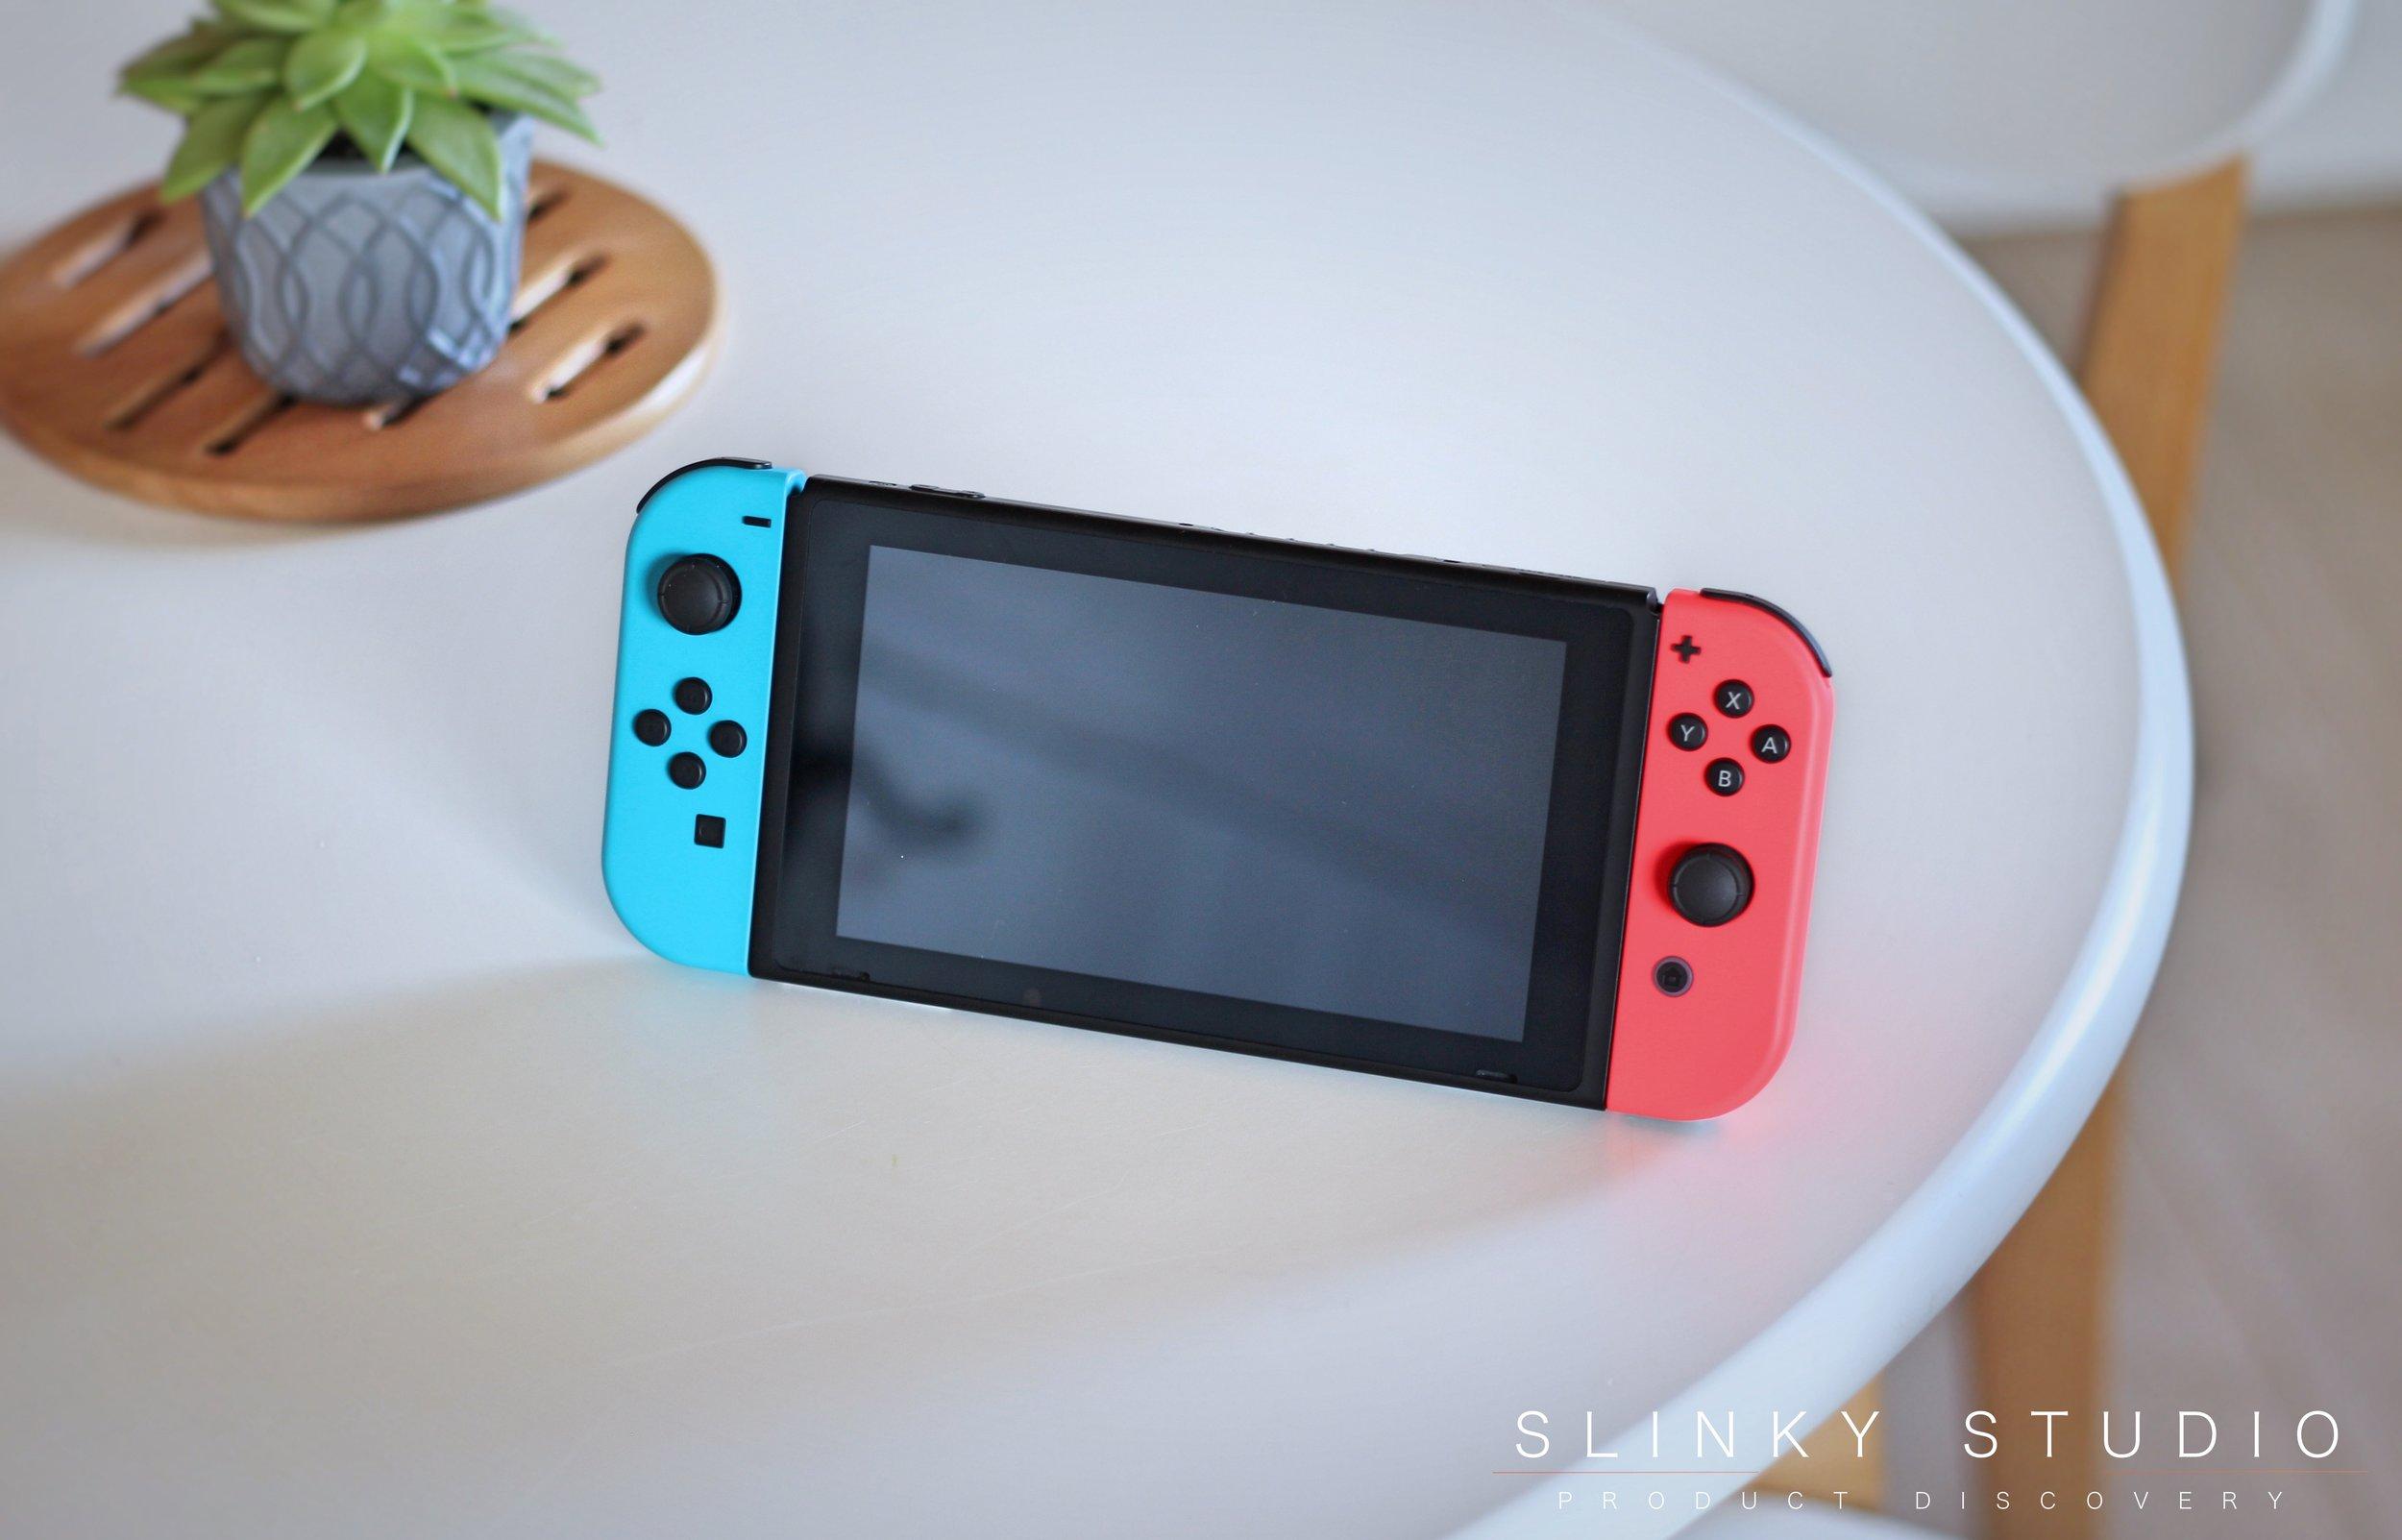 Nintendo Switch Photoshoot Photography White Table Background Room Setting.jpg